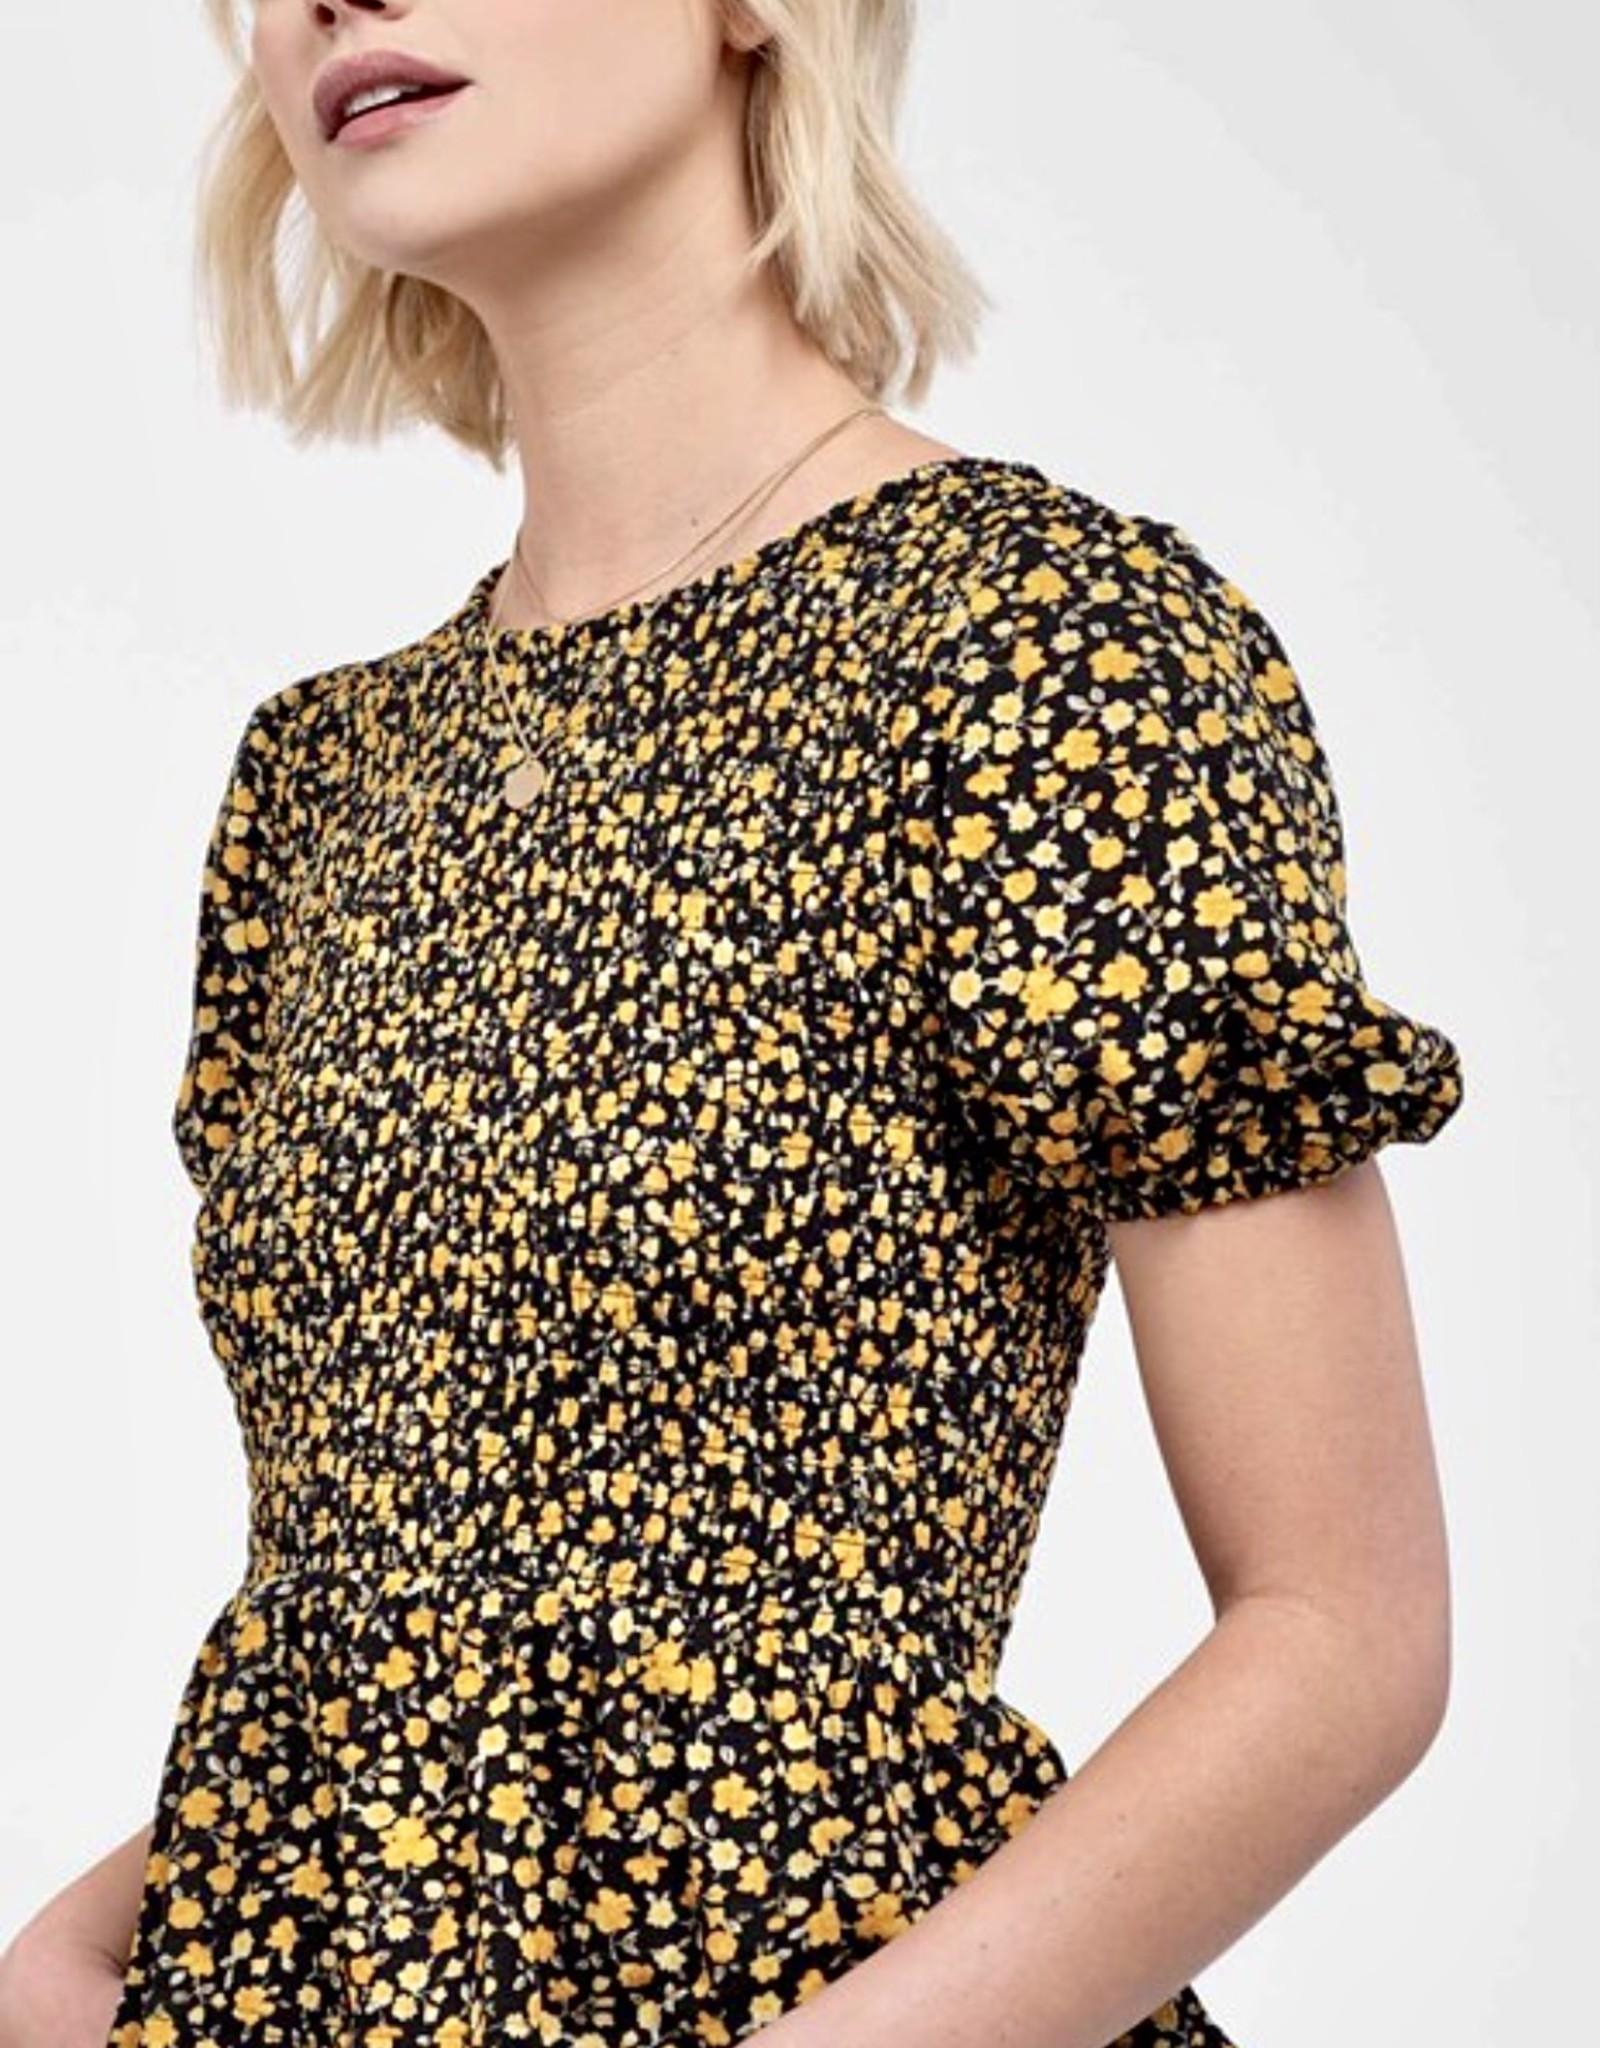 HUSH Woven smocked ditsy floral peplum blouse